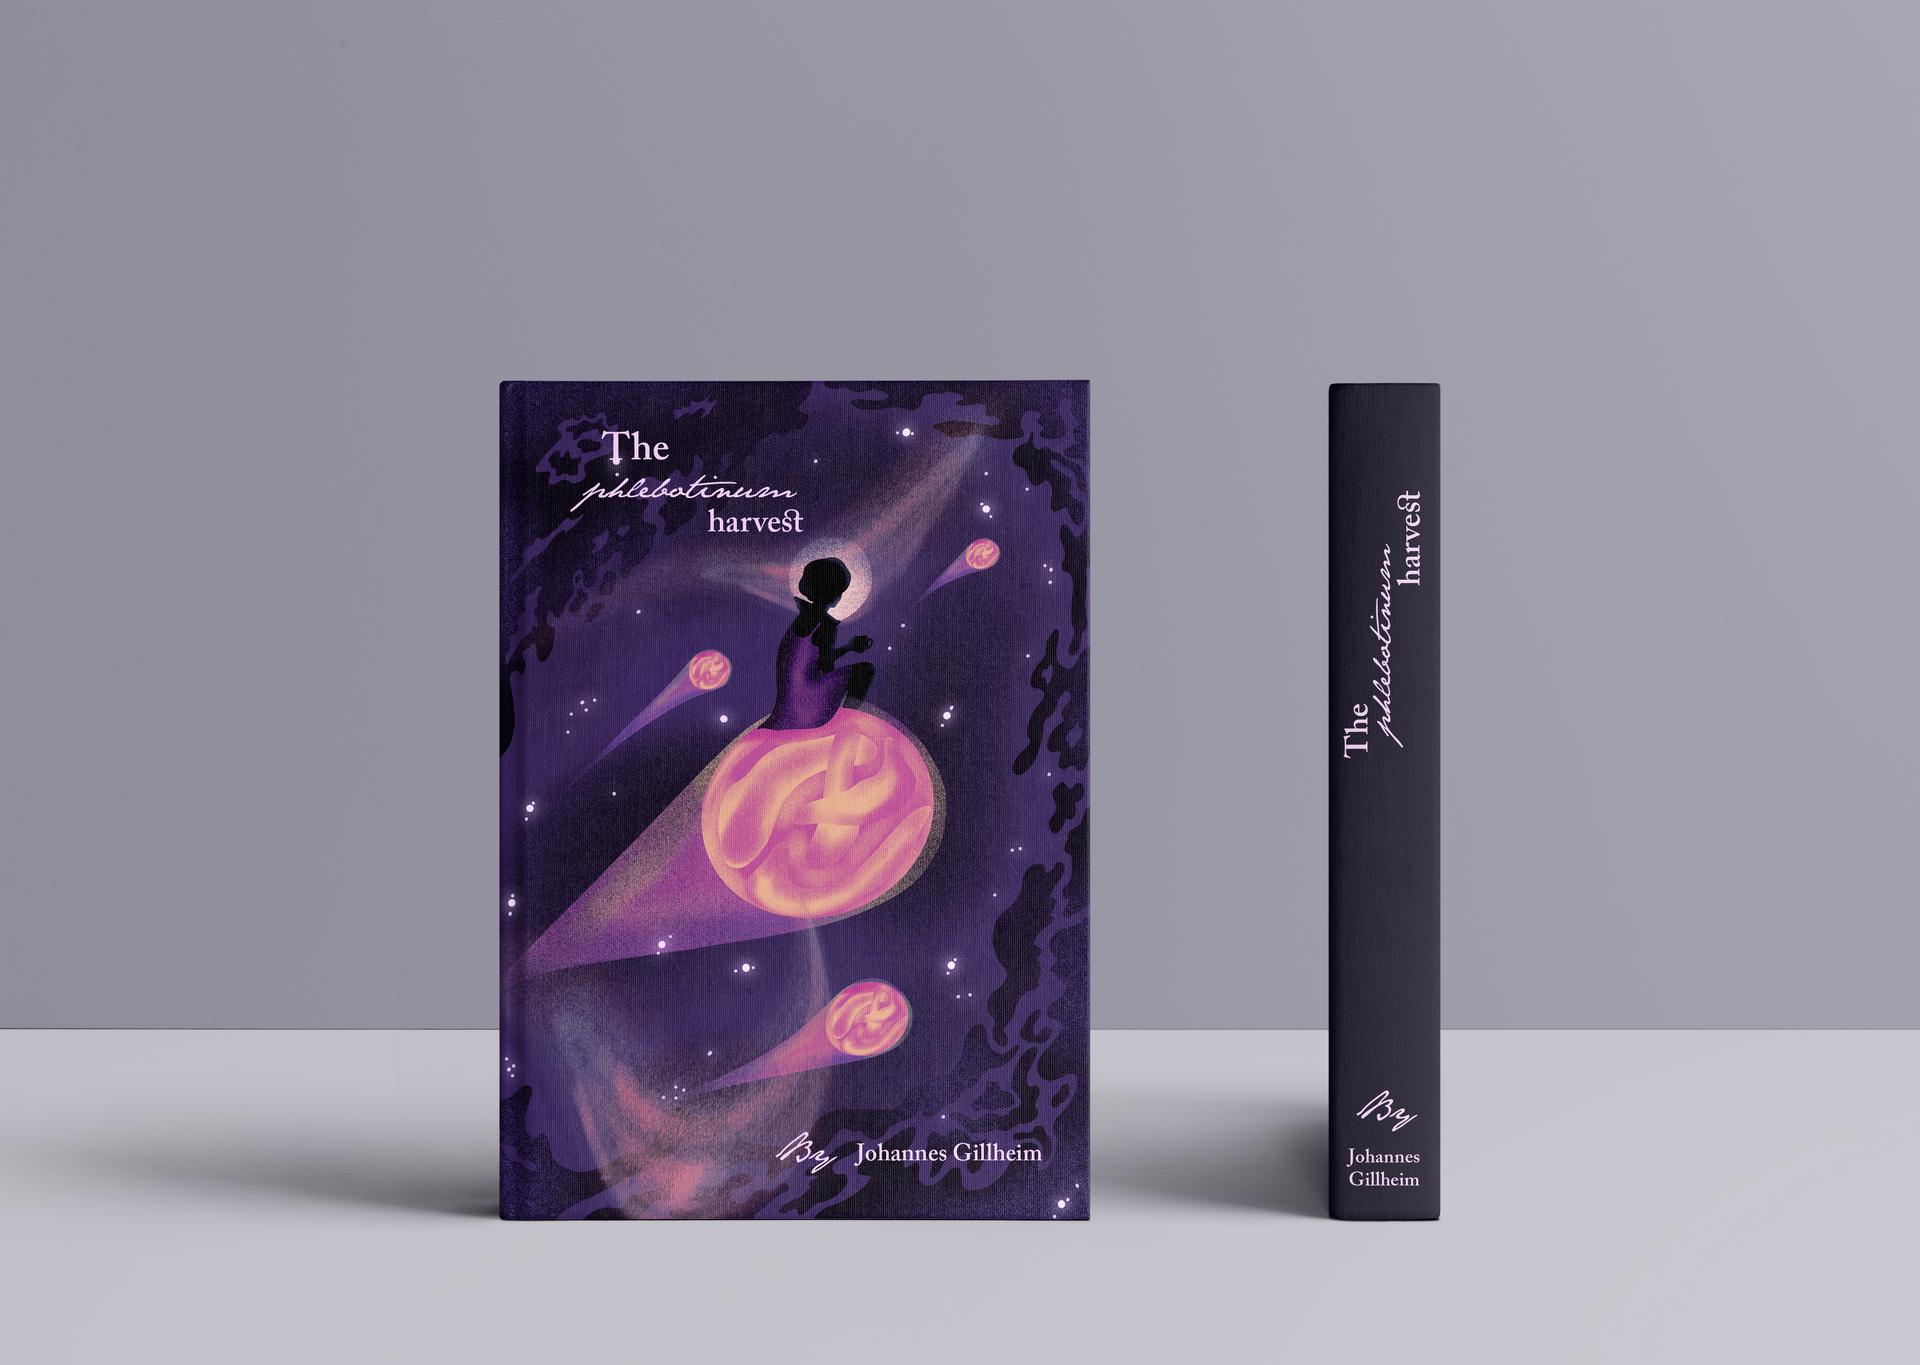 The Phlebotinum Harvest Book Cover Mocku